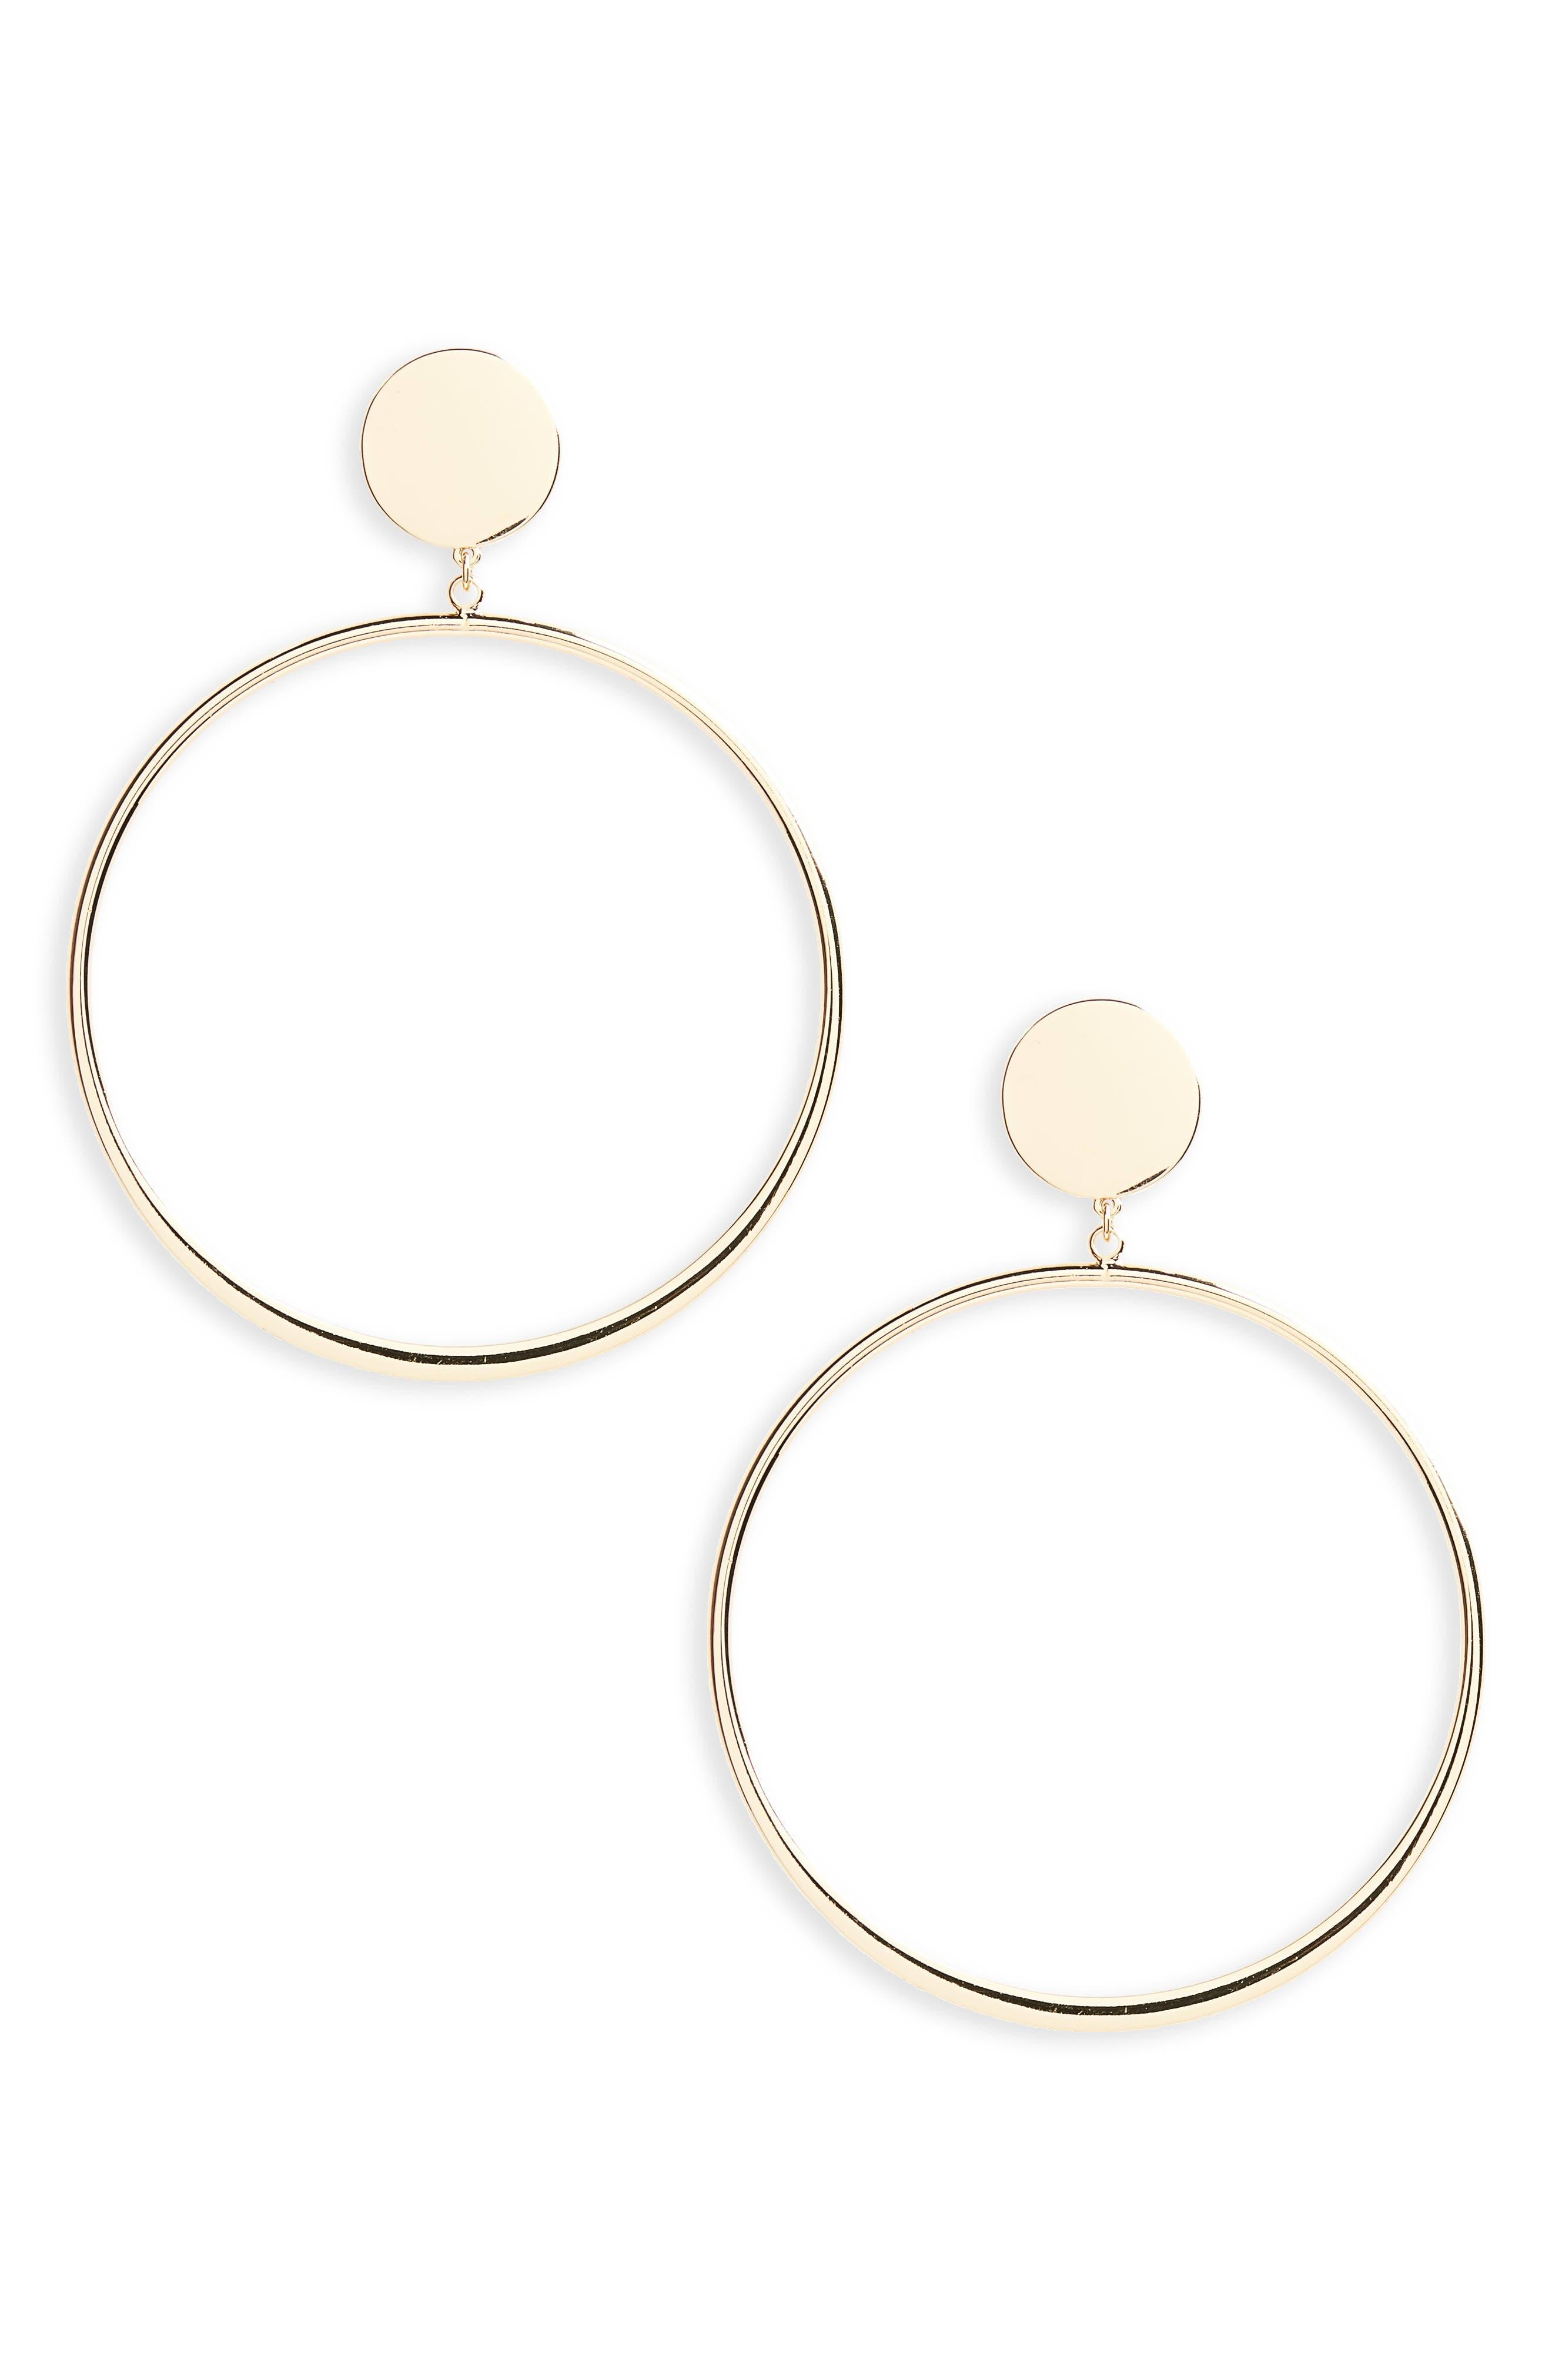 Circle Hoop Earrings,                             Main thumbnail 1, color,                             710